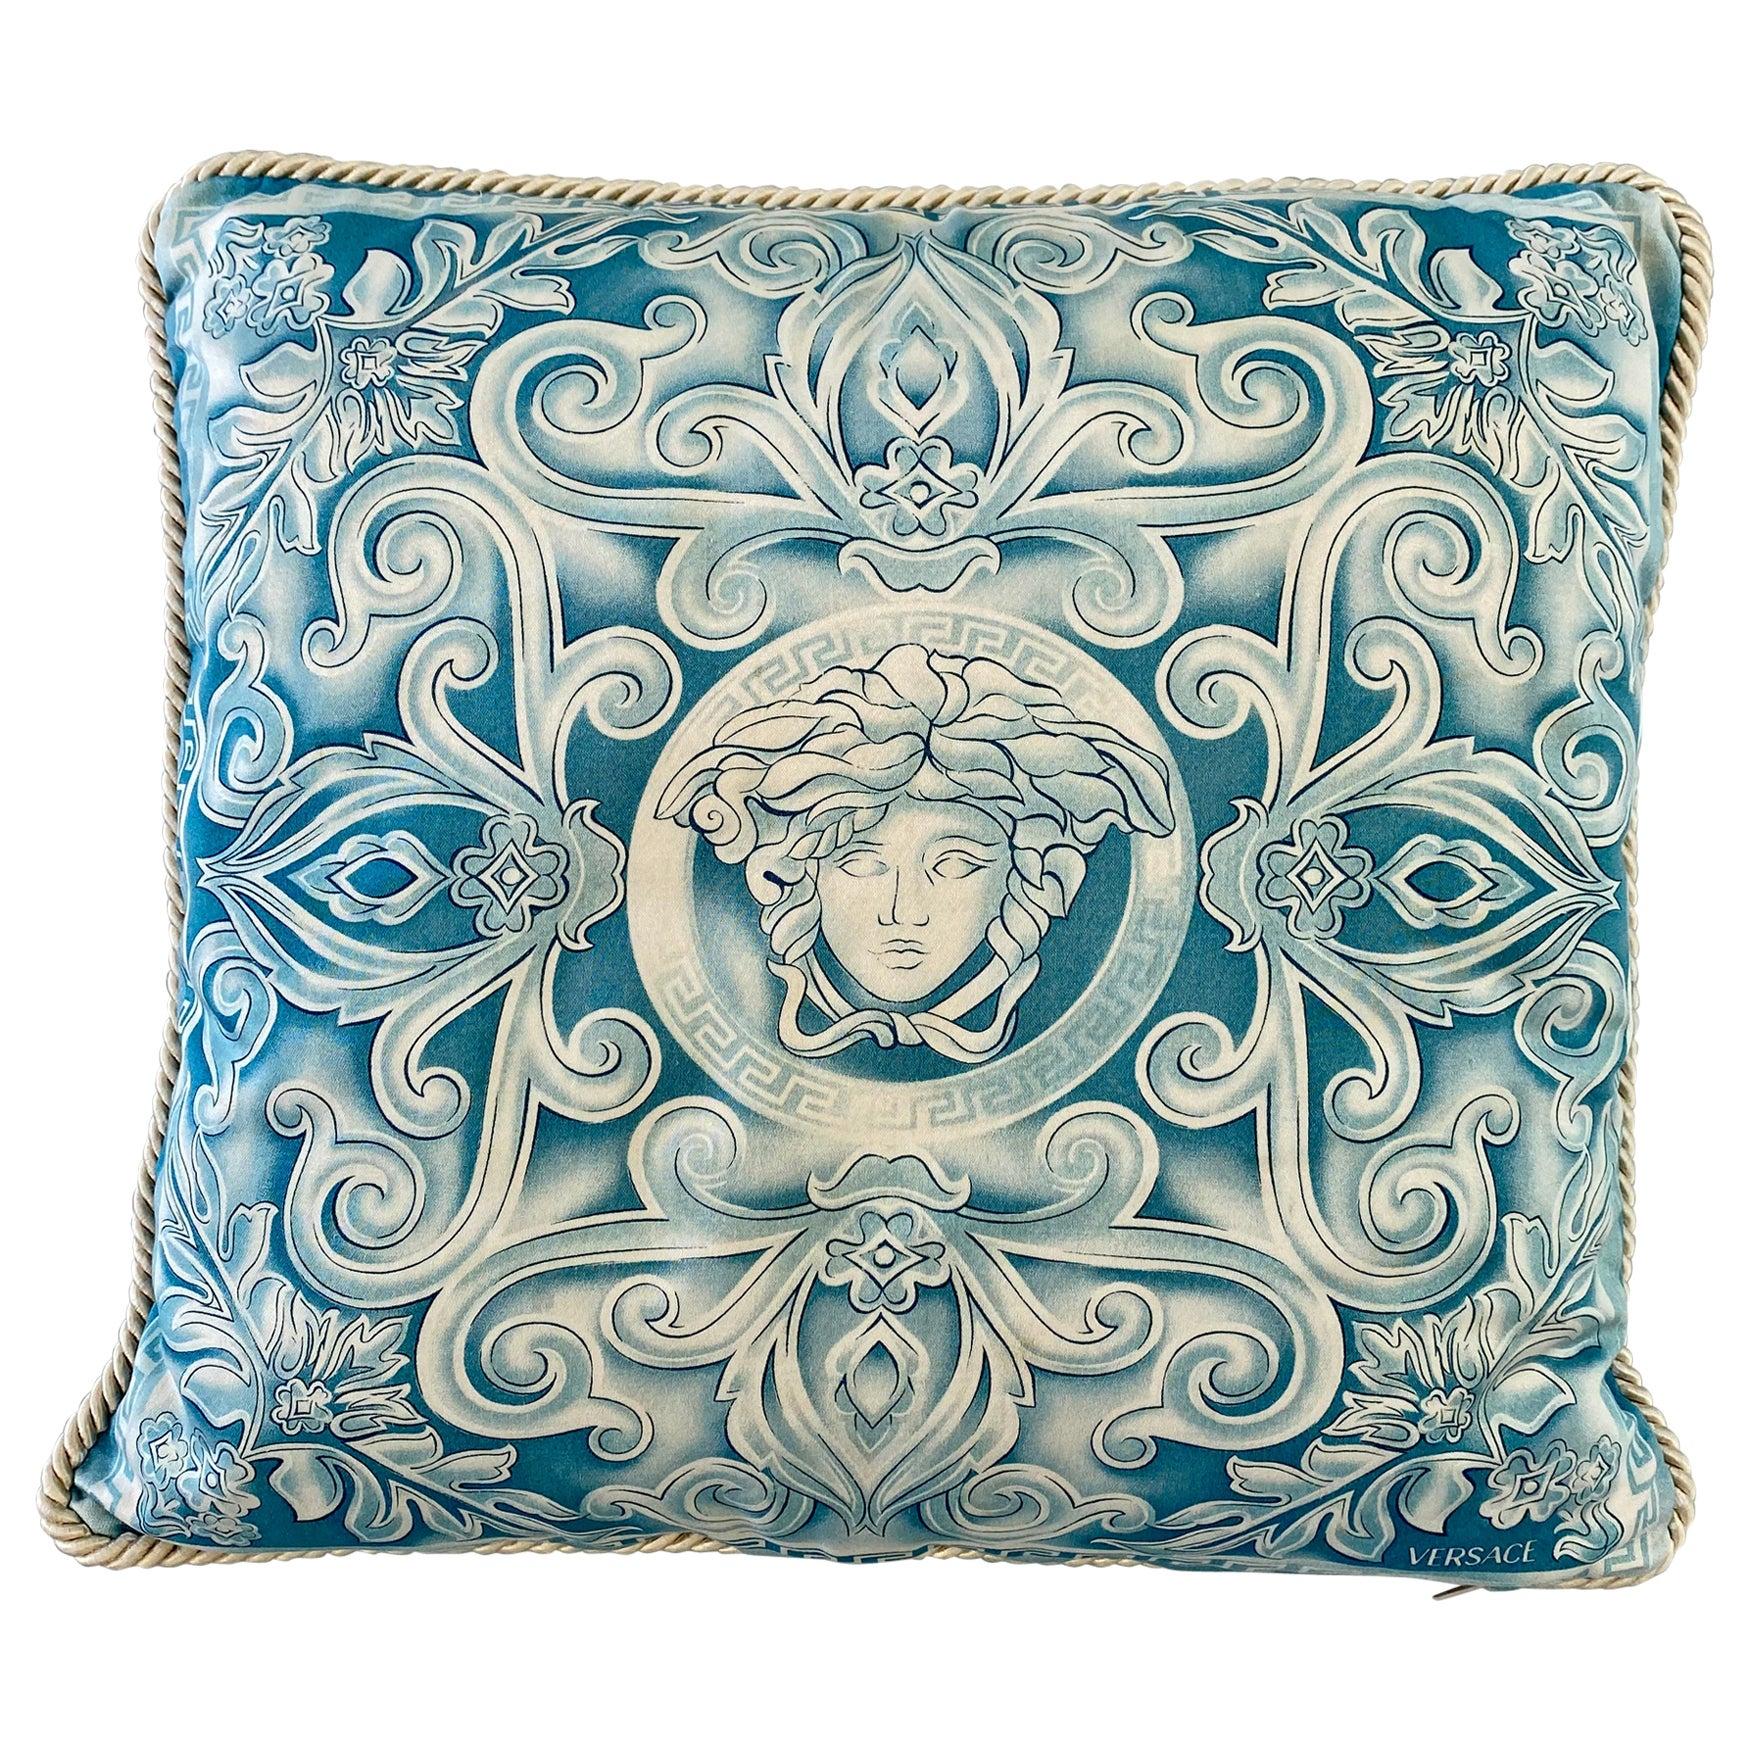 Versace Vintage Medusa Pillow